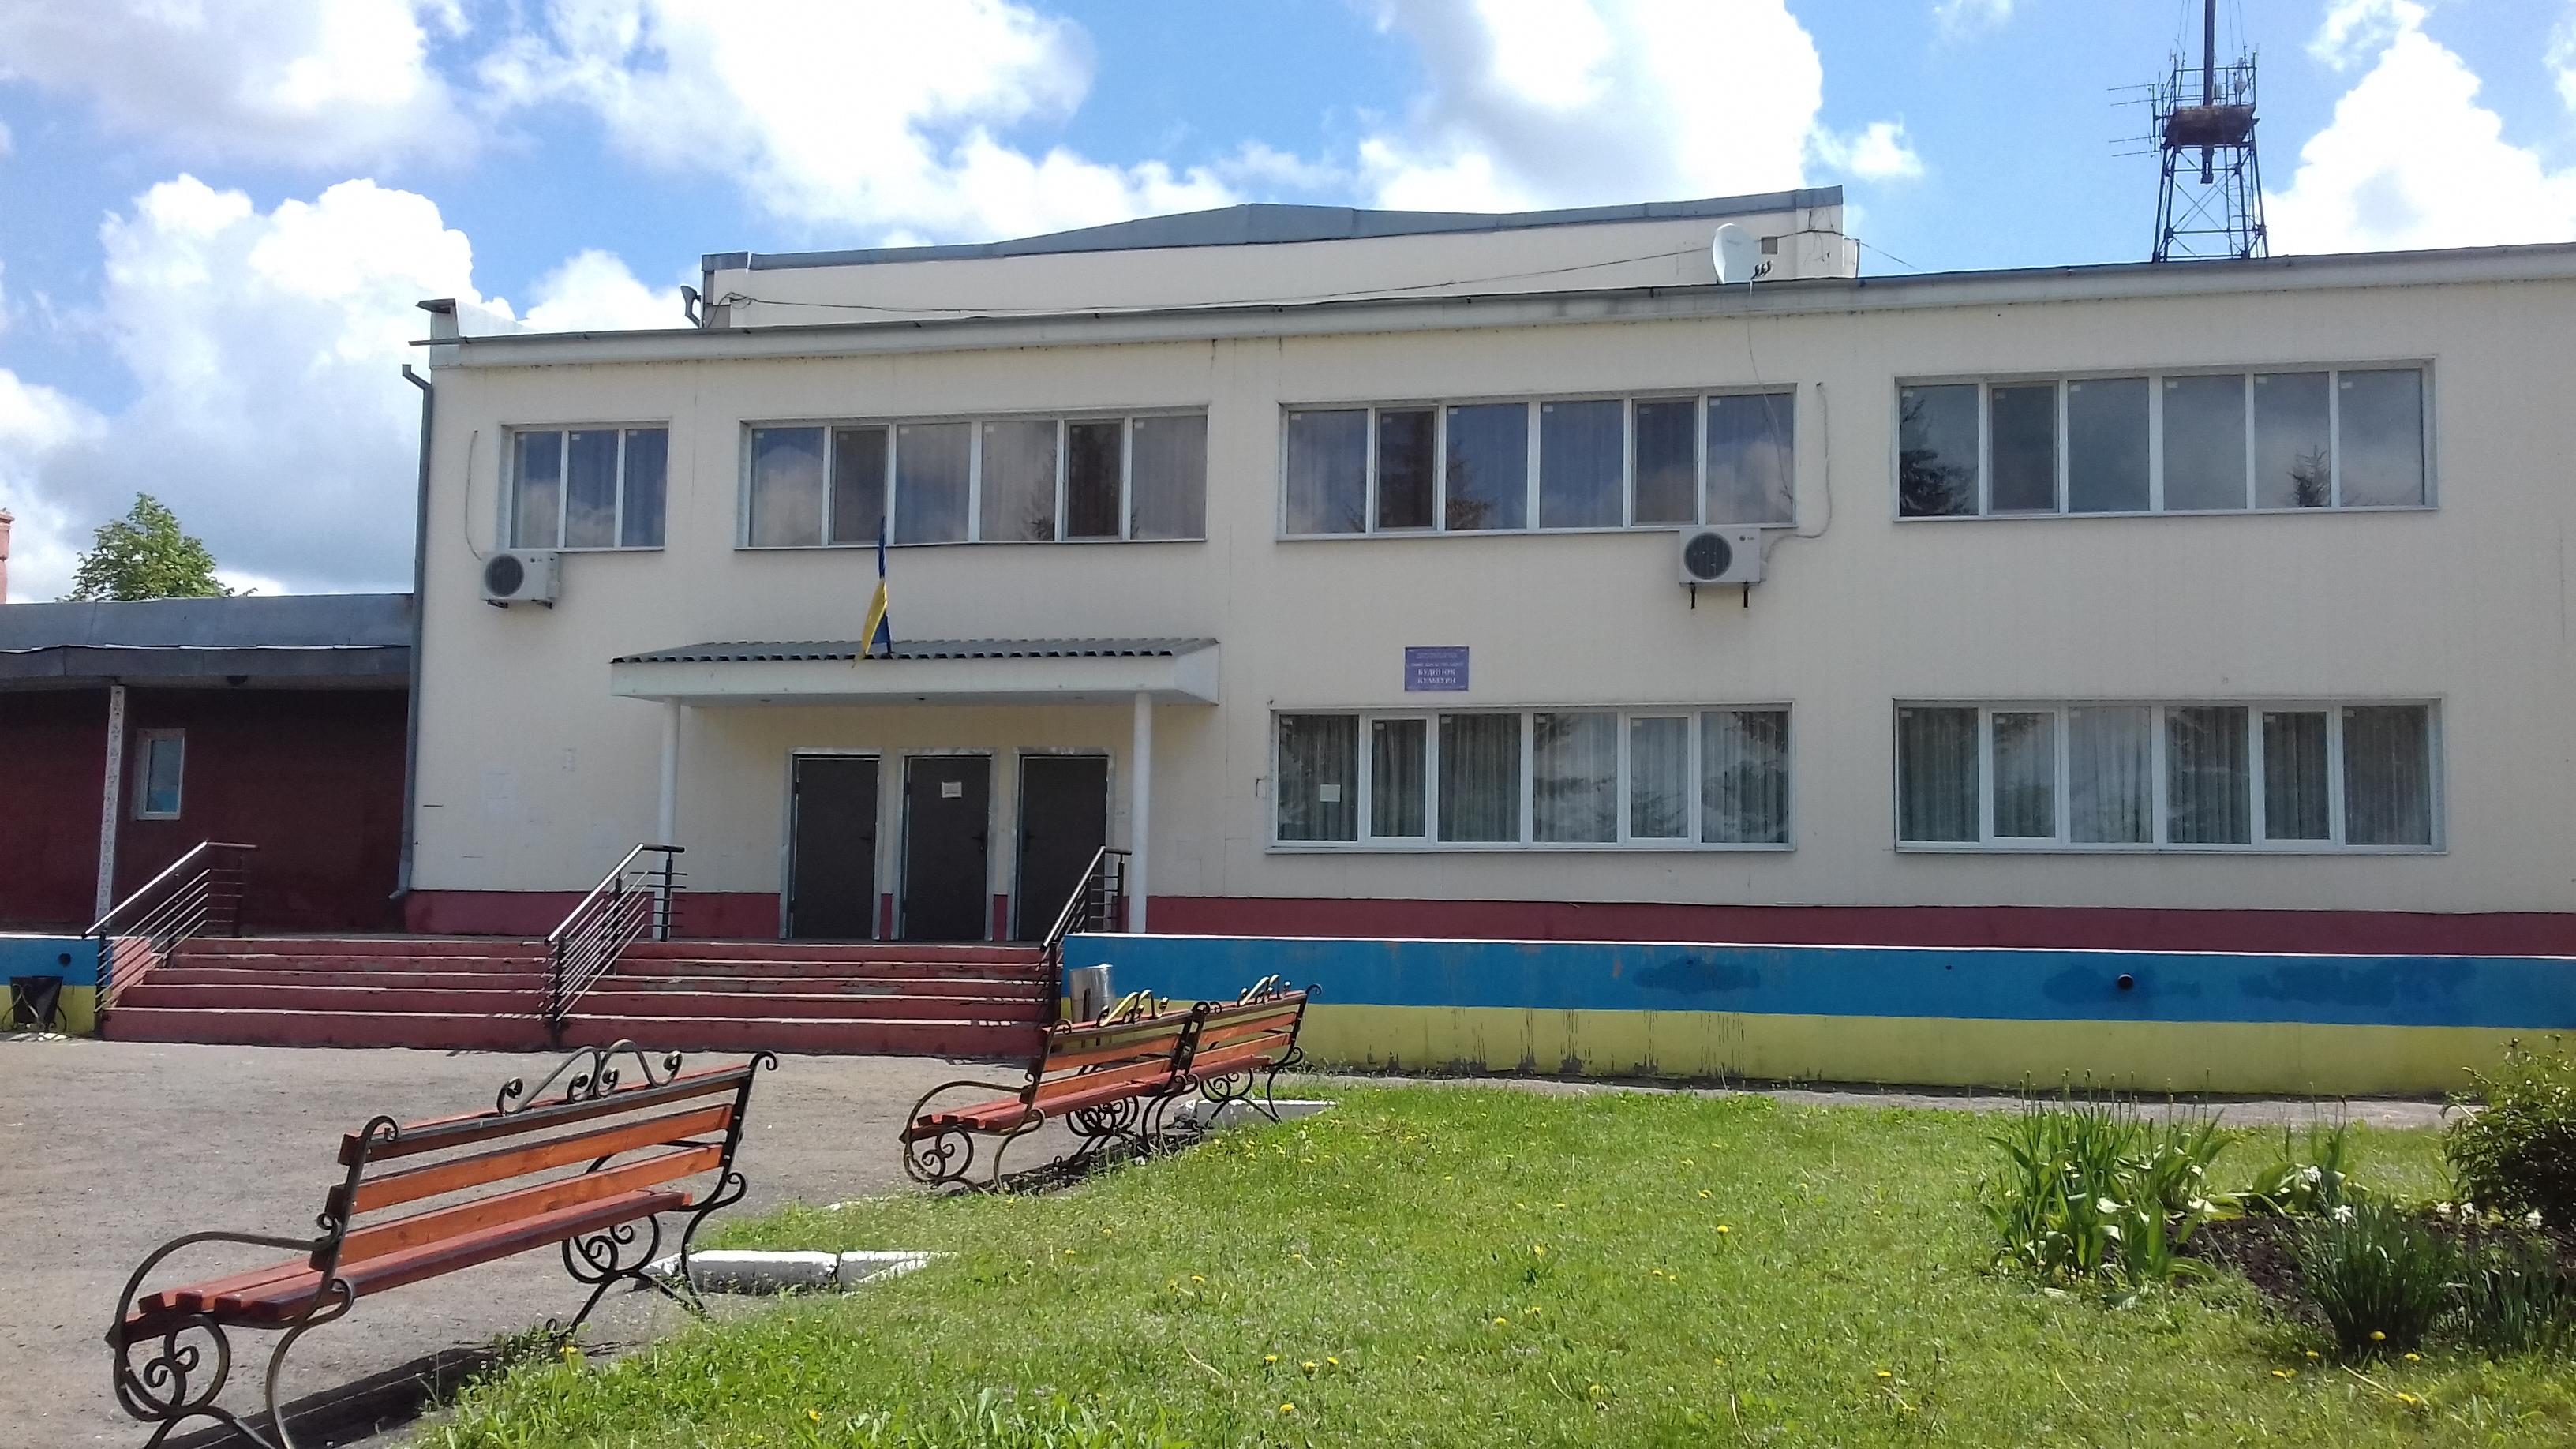 Будинок культури села Попельнасте Попельнастівської сільської ради